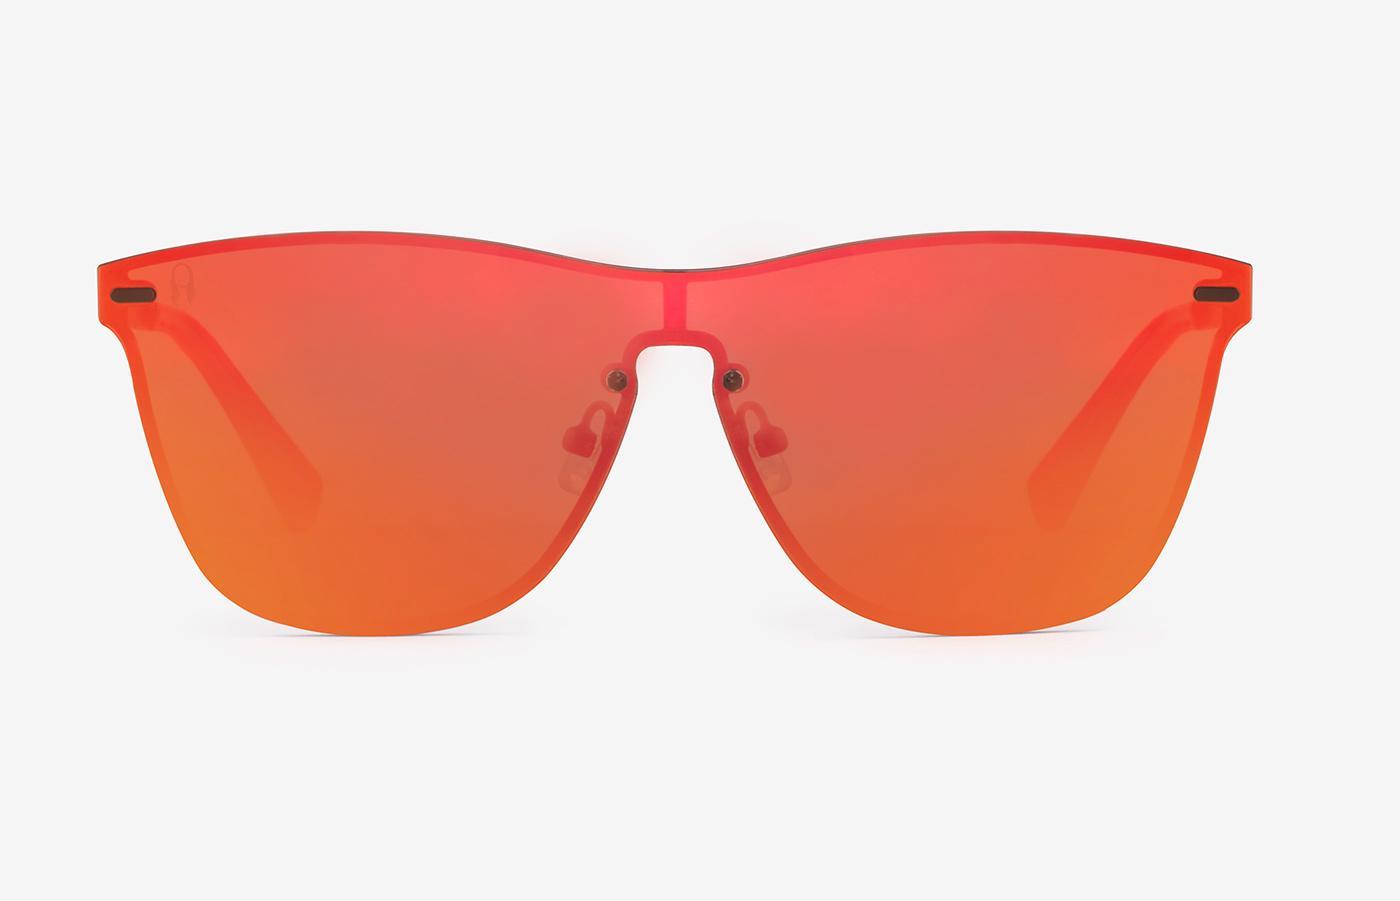 b6976b94b6 Gafas · Hawkers Sol Neon x Ruby Hawkers de One Steve Venm Aoki qH4rq